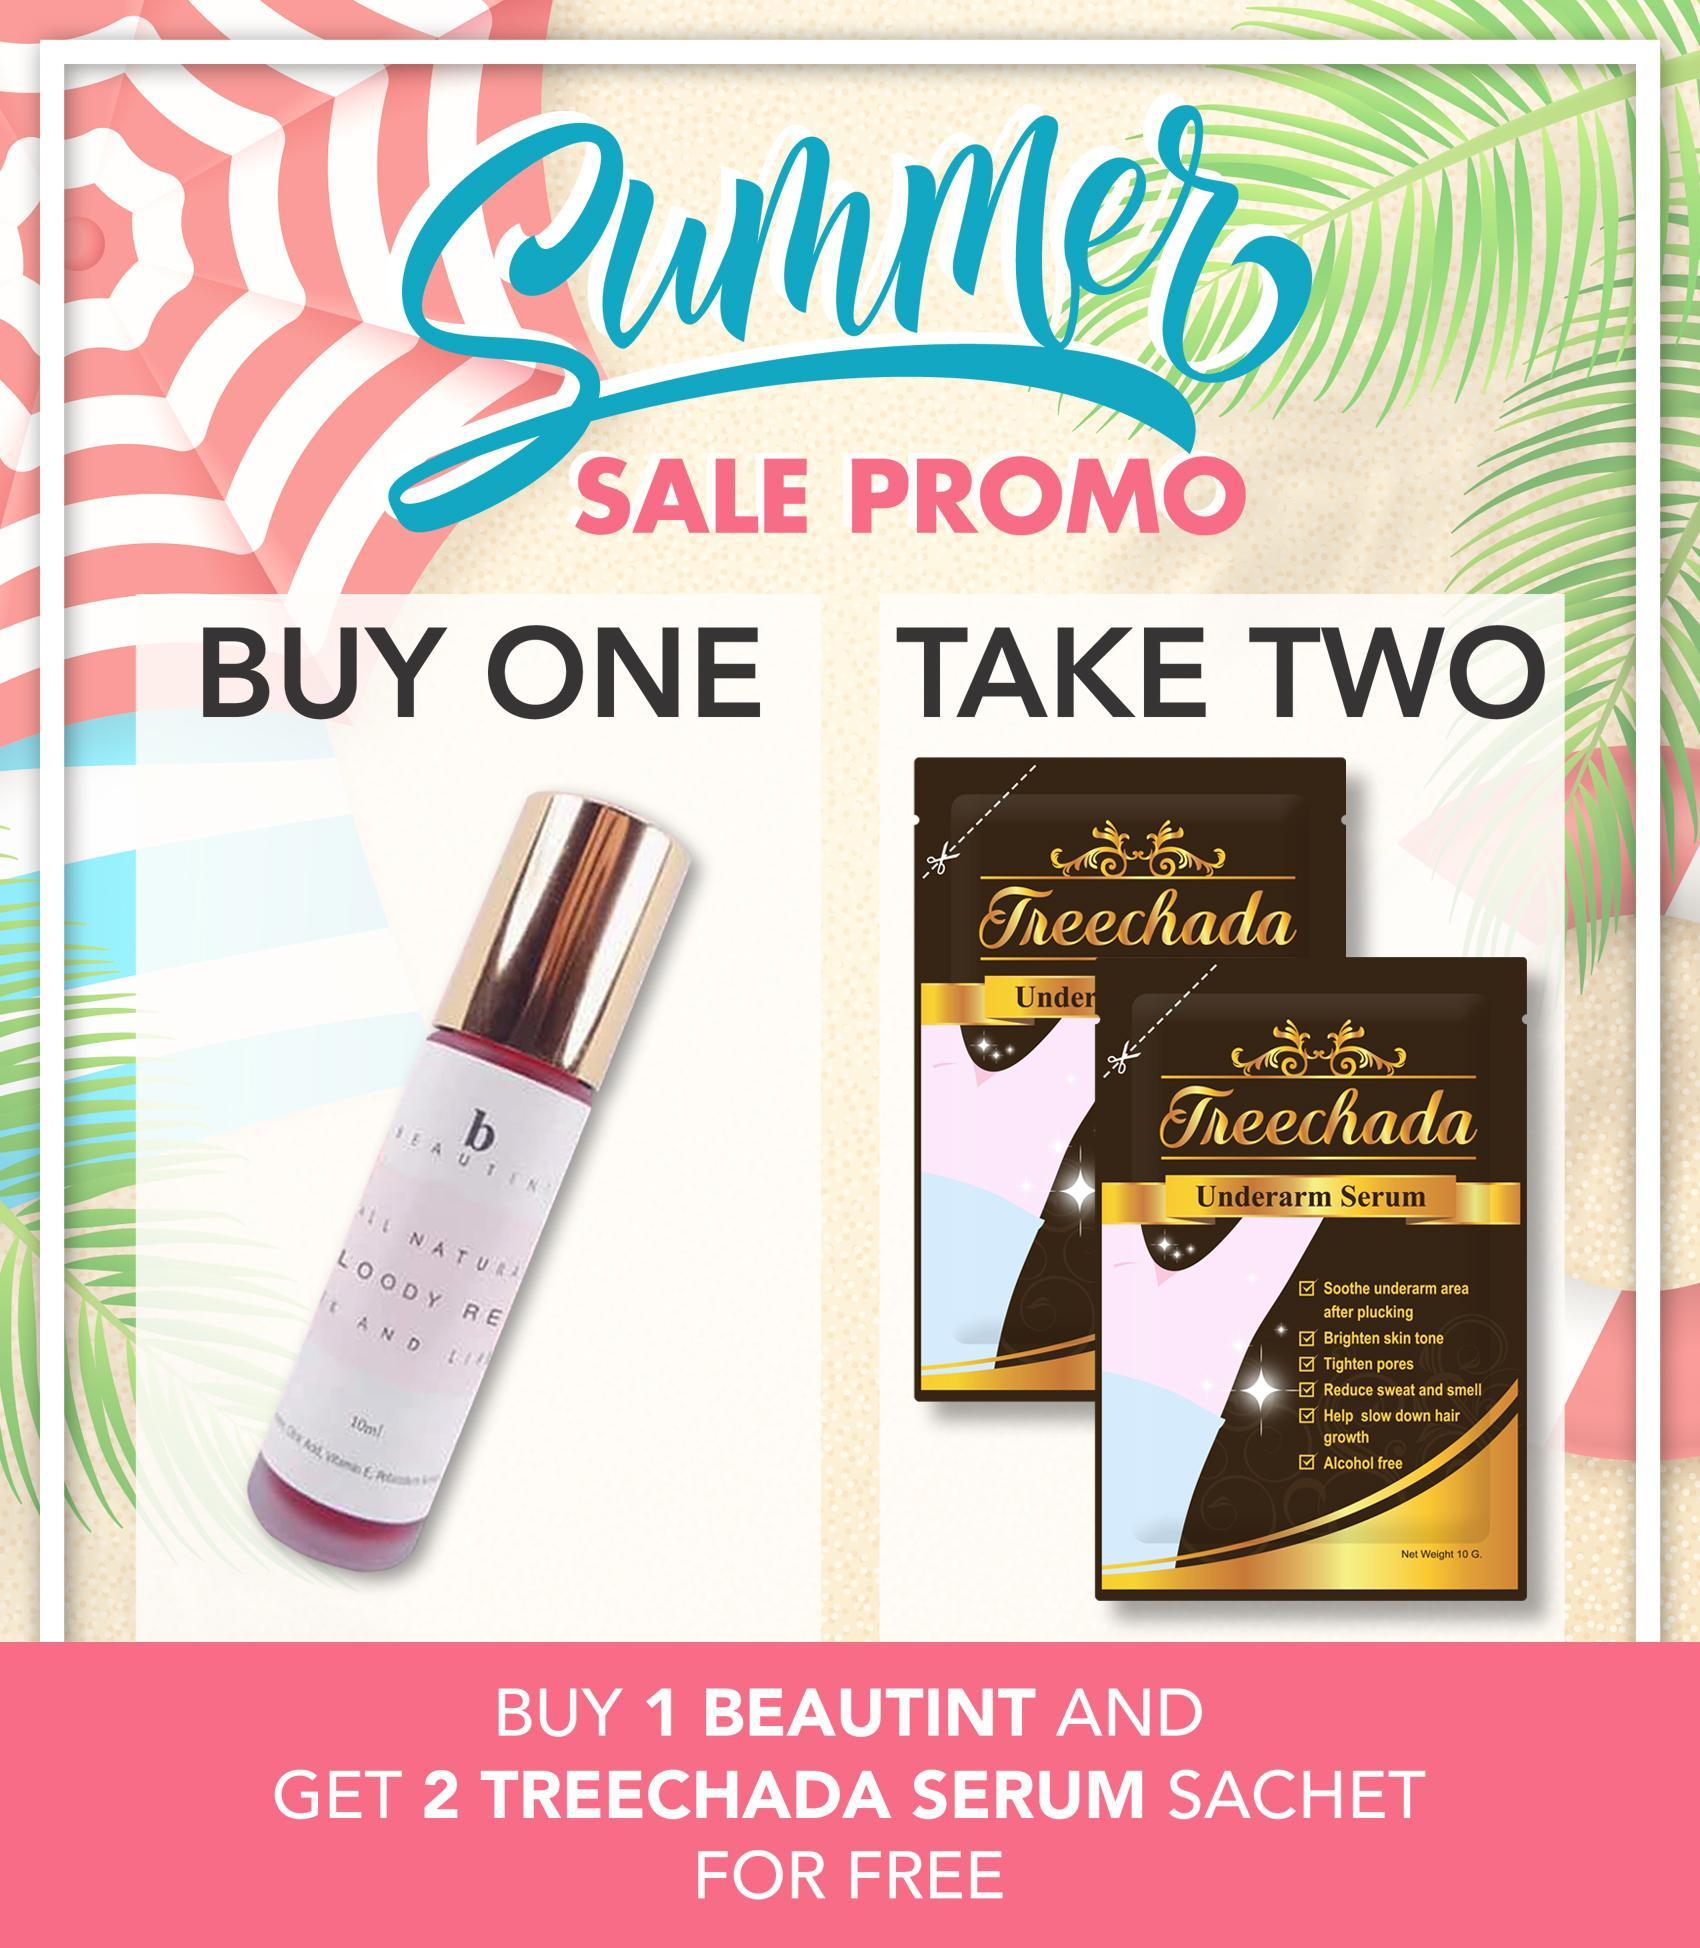 4273359f13c9 Beautint Free 2pcs Treechada Organic Lip and Cheek Tint